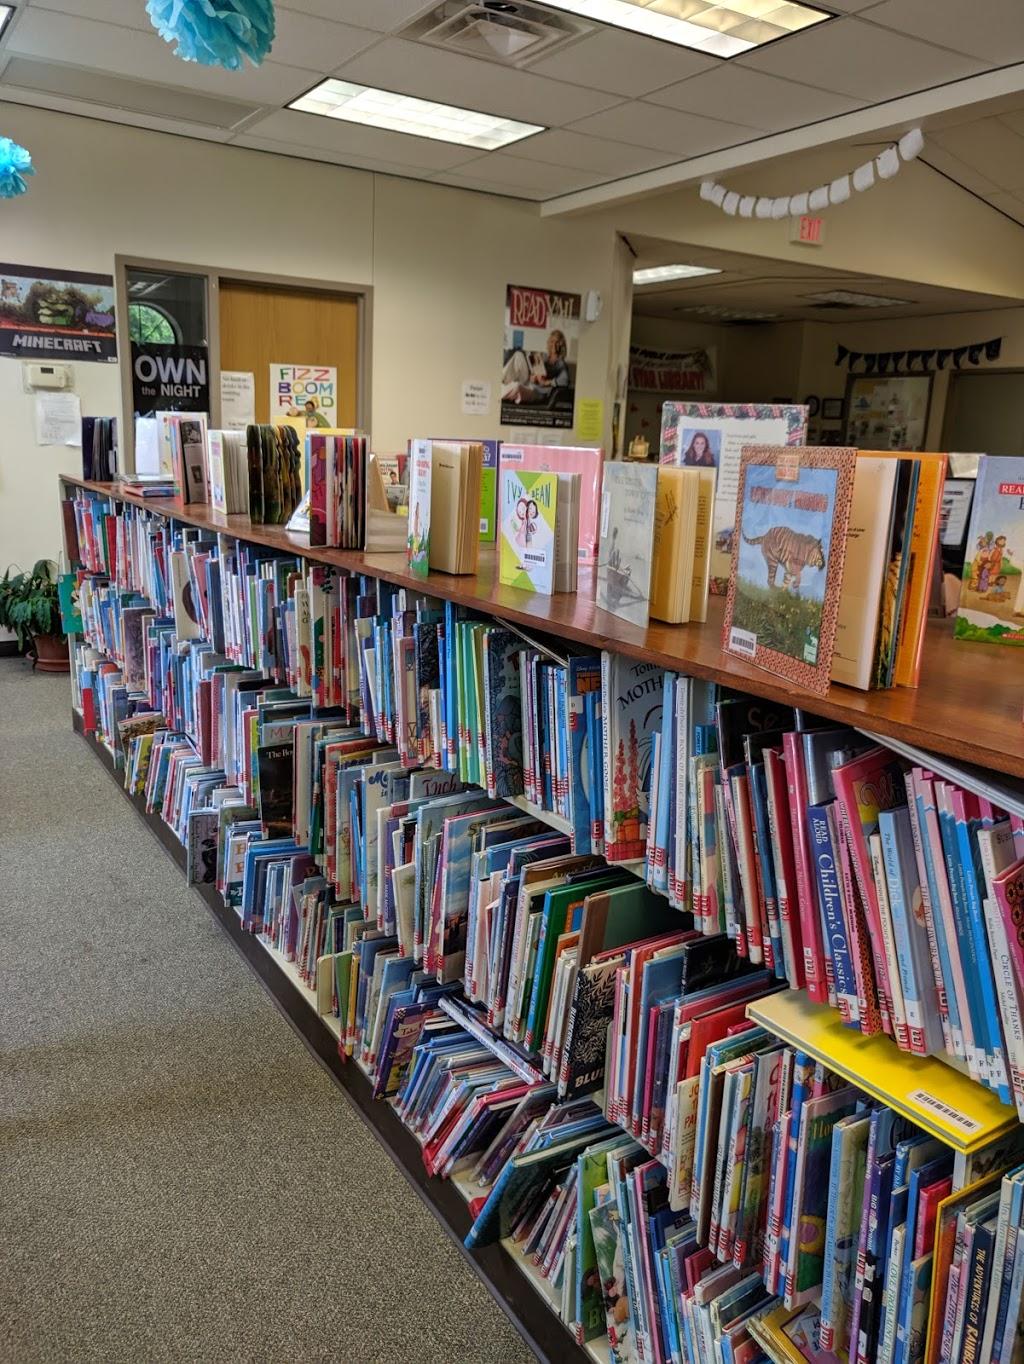 Mounds City Public Library - library  | Photo 1 of 3 | Address: 14 14th St, Mounds, OK 74047, USA | Phone: (918) 827-3949